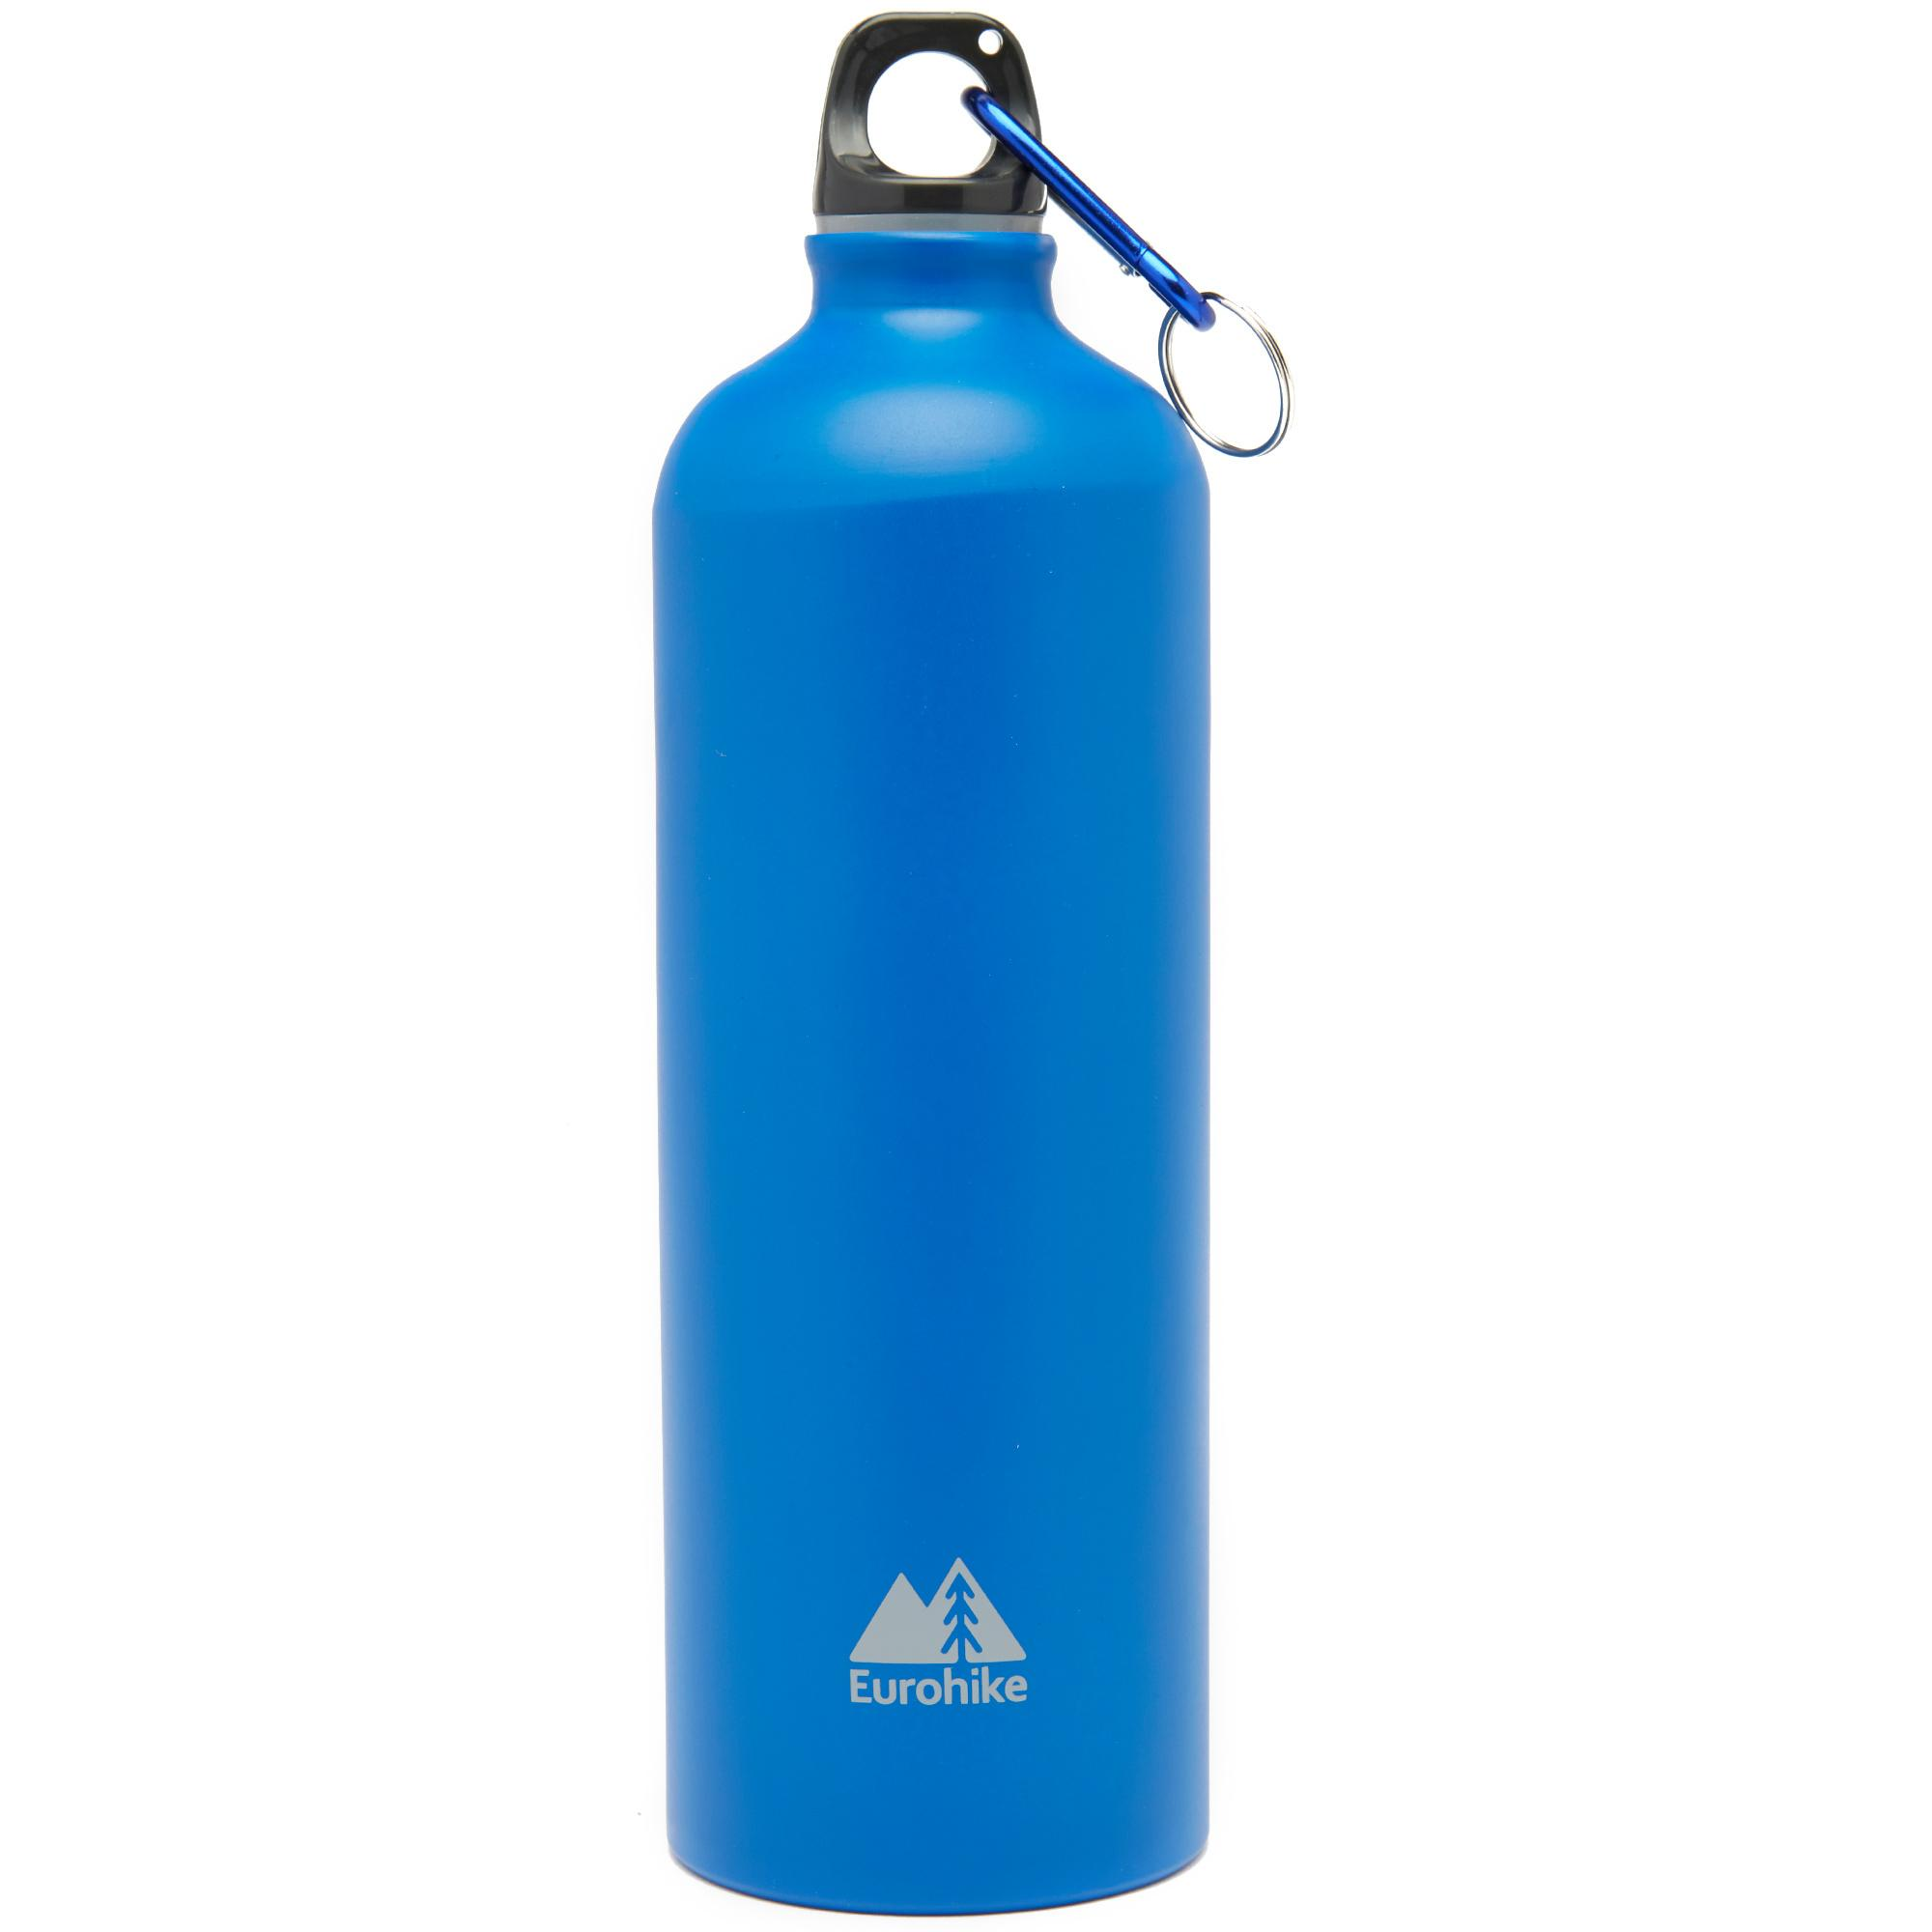 Eurohike Aqua 1l Aluminium Bottle - Blue/blue  Blue/blue